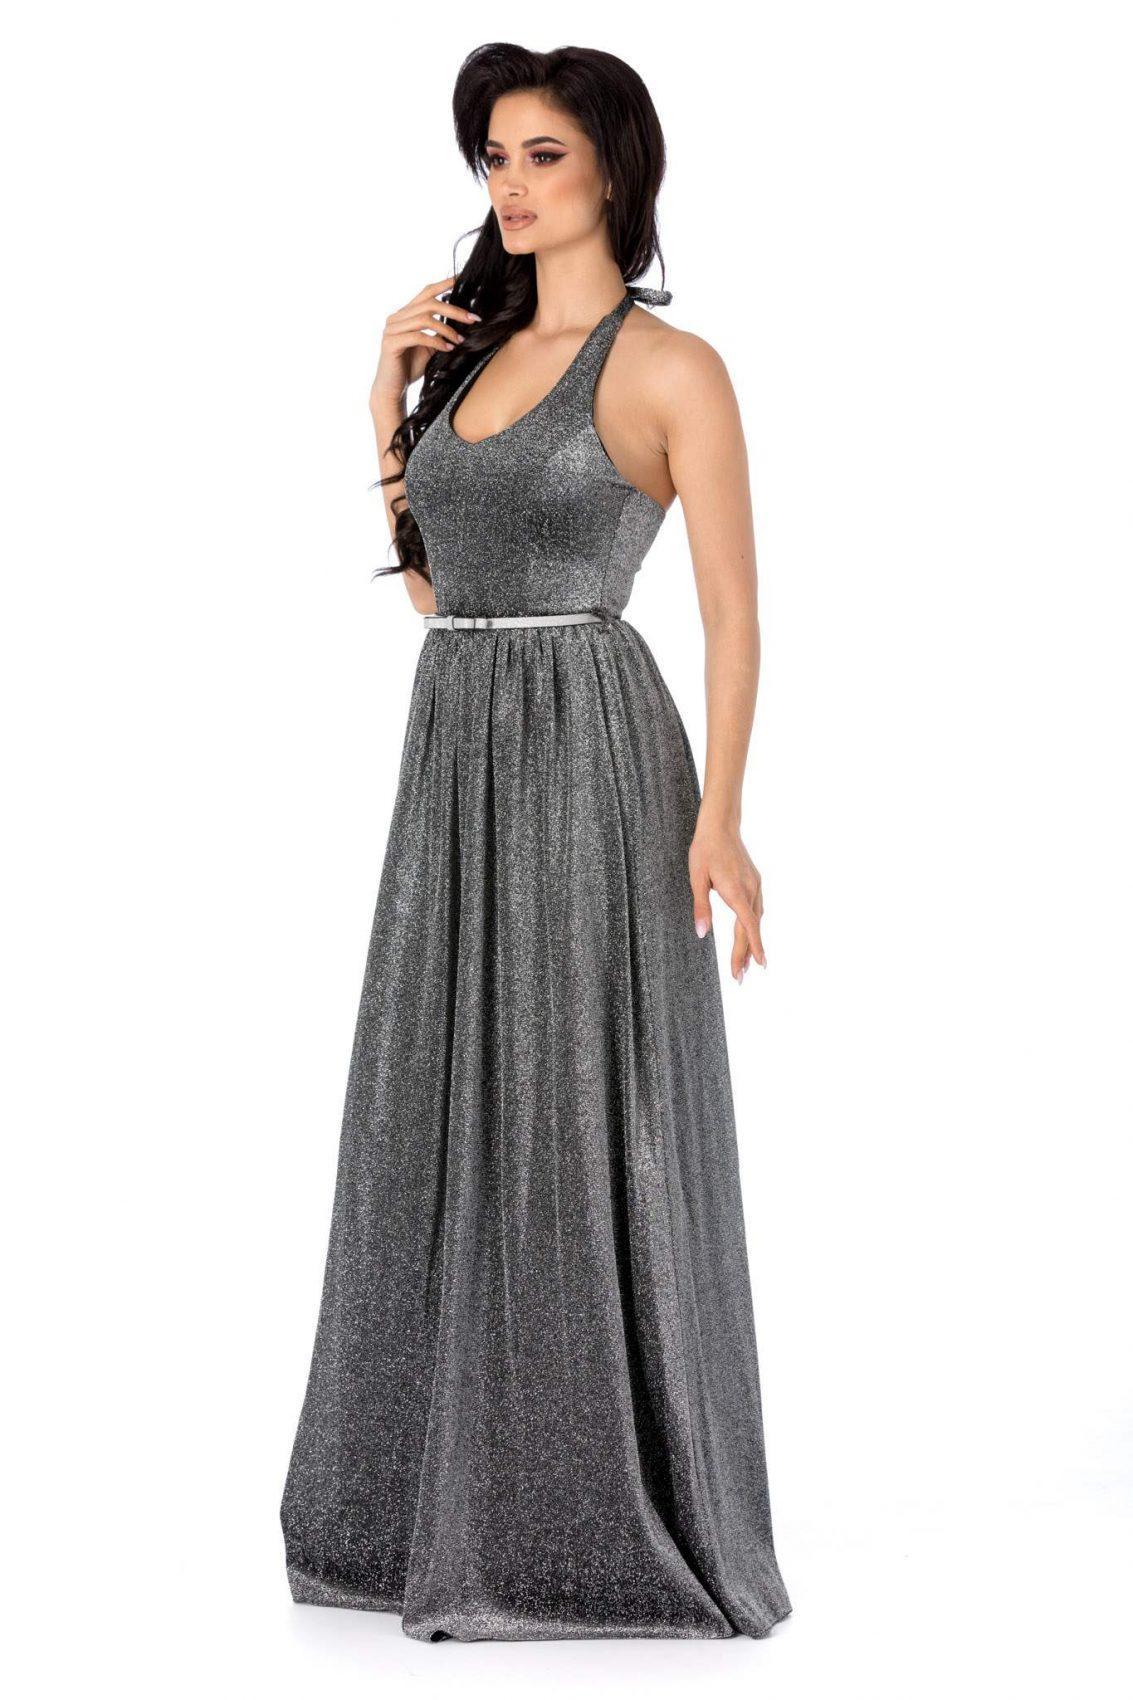 Calypso Ασημί Φόρεμα 3136